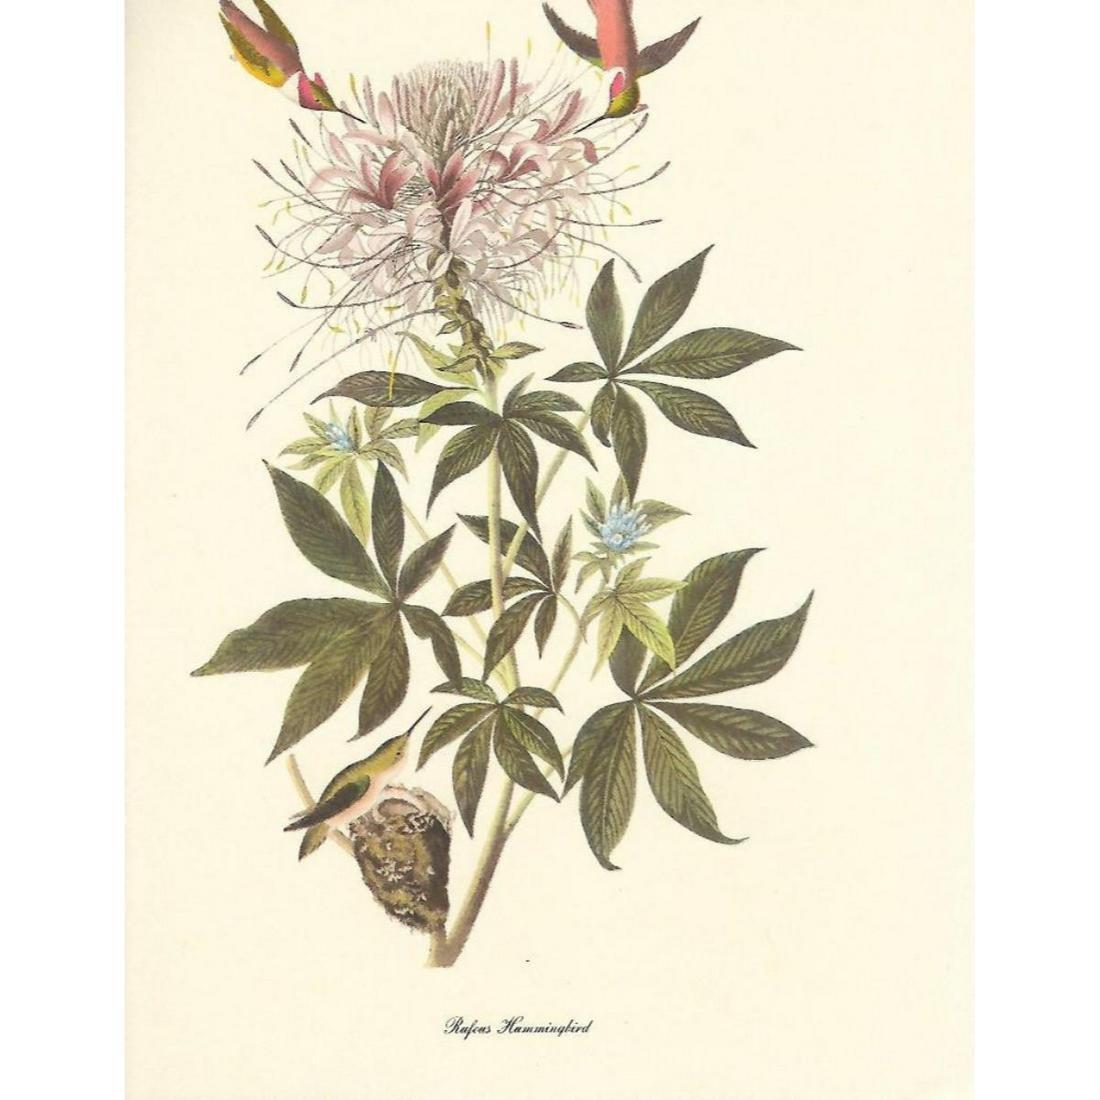 c1950 Audubon Print, Rufus Hummingbird